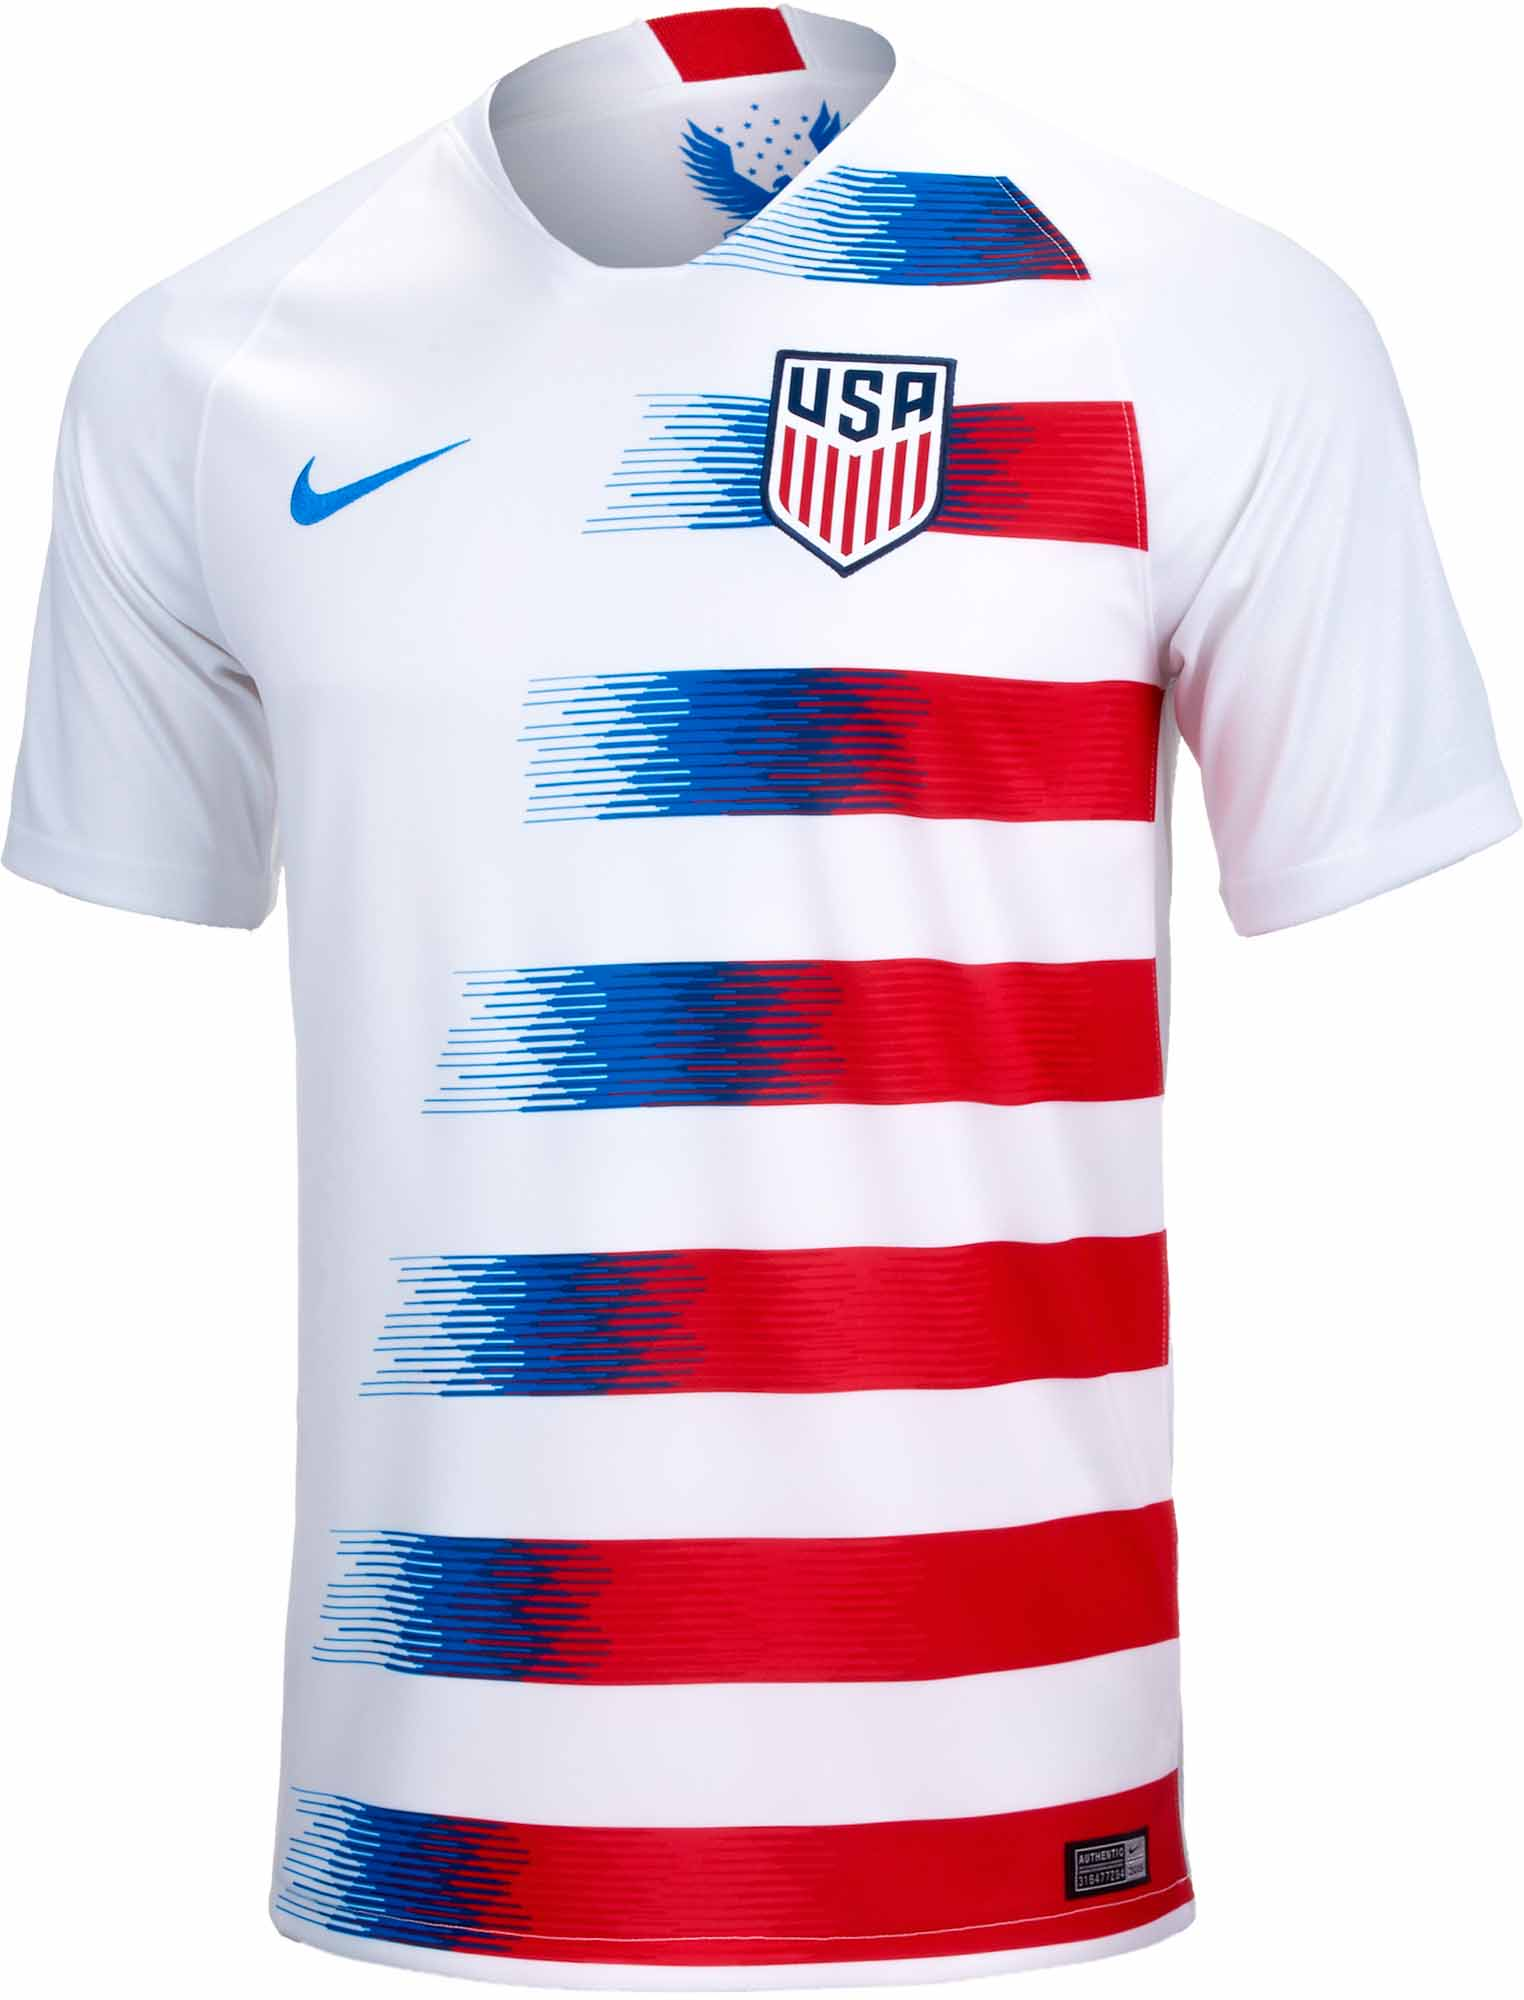 5196e651f Nike USA Home Jersey 2018-19 - SoccerPro.com